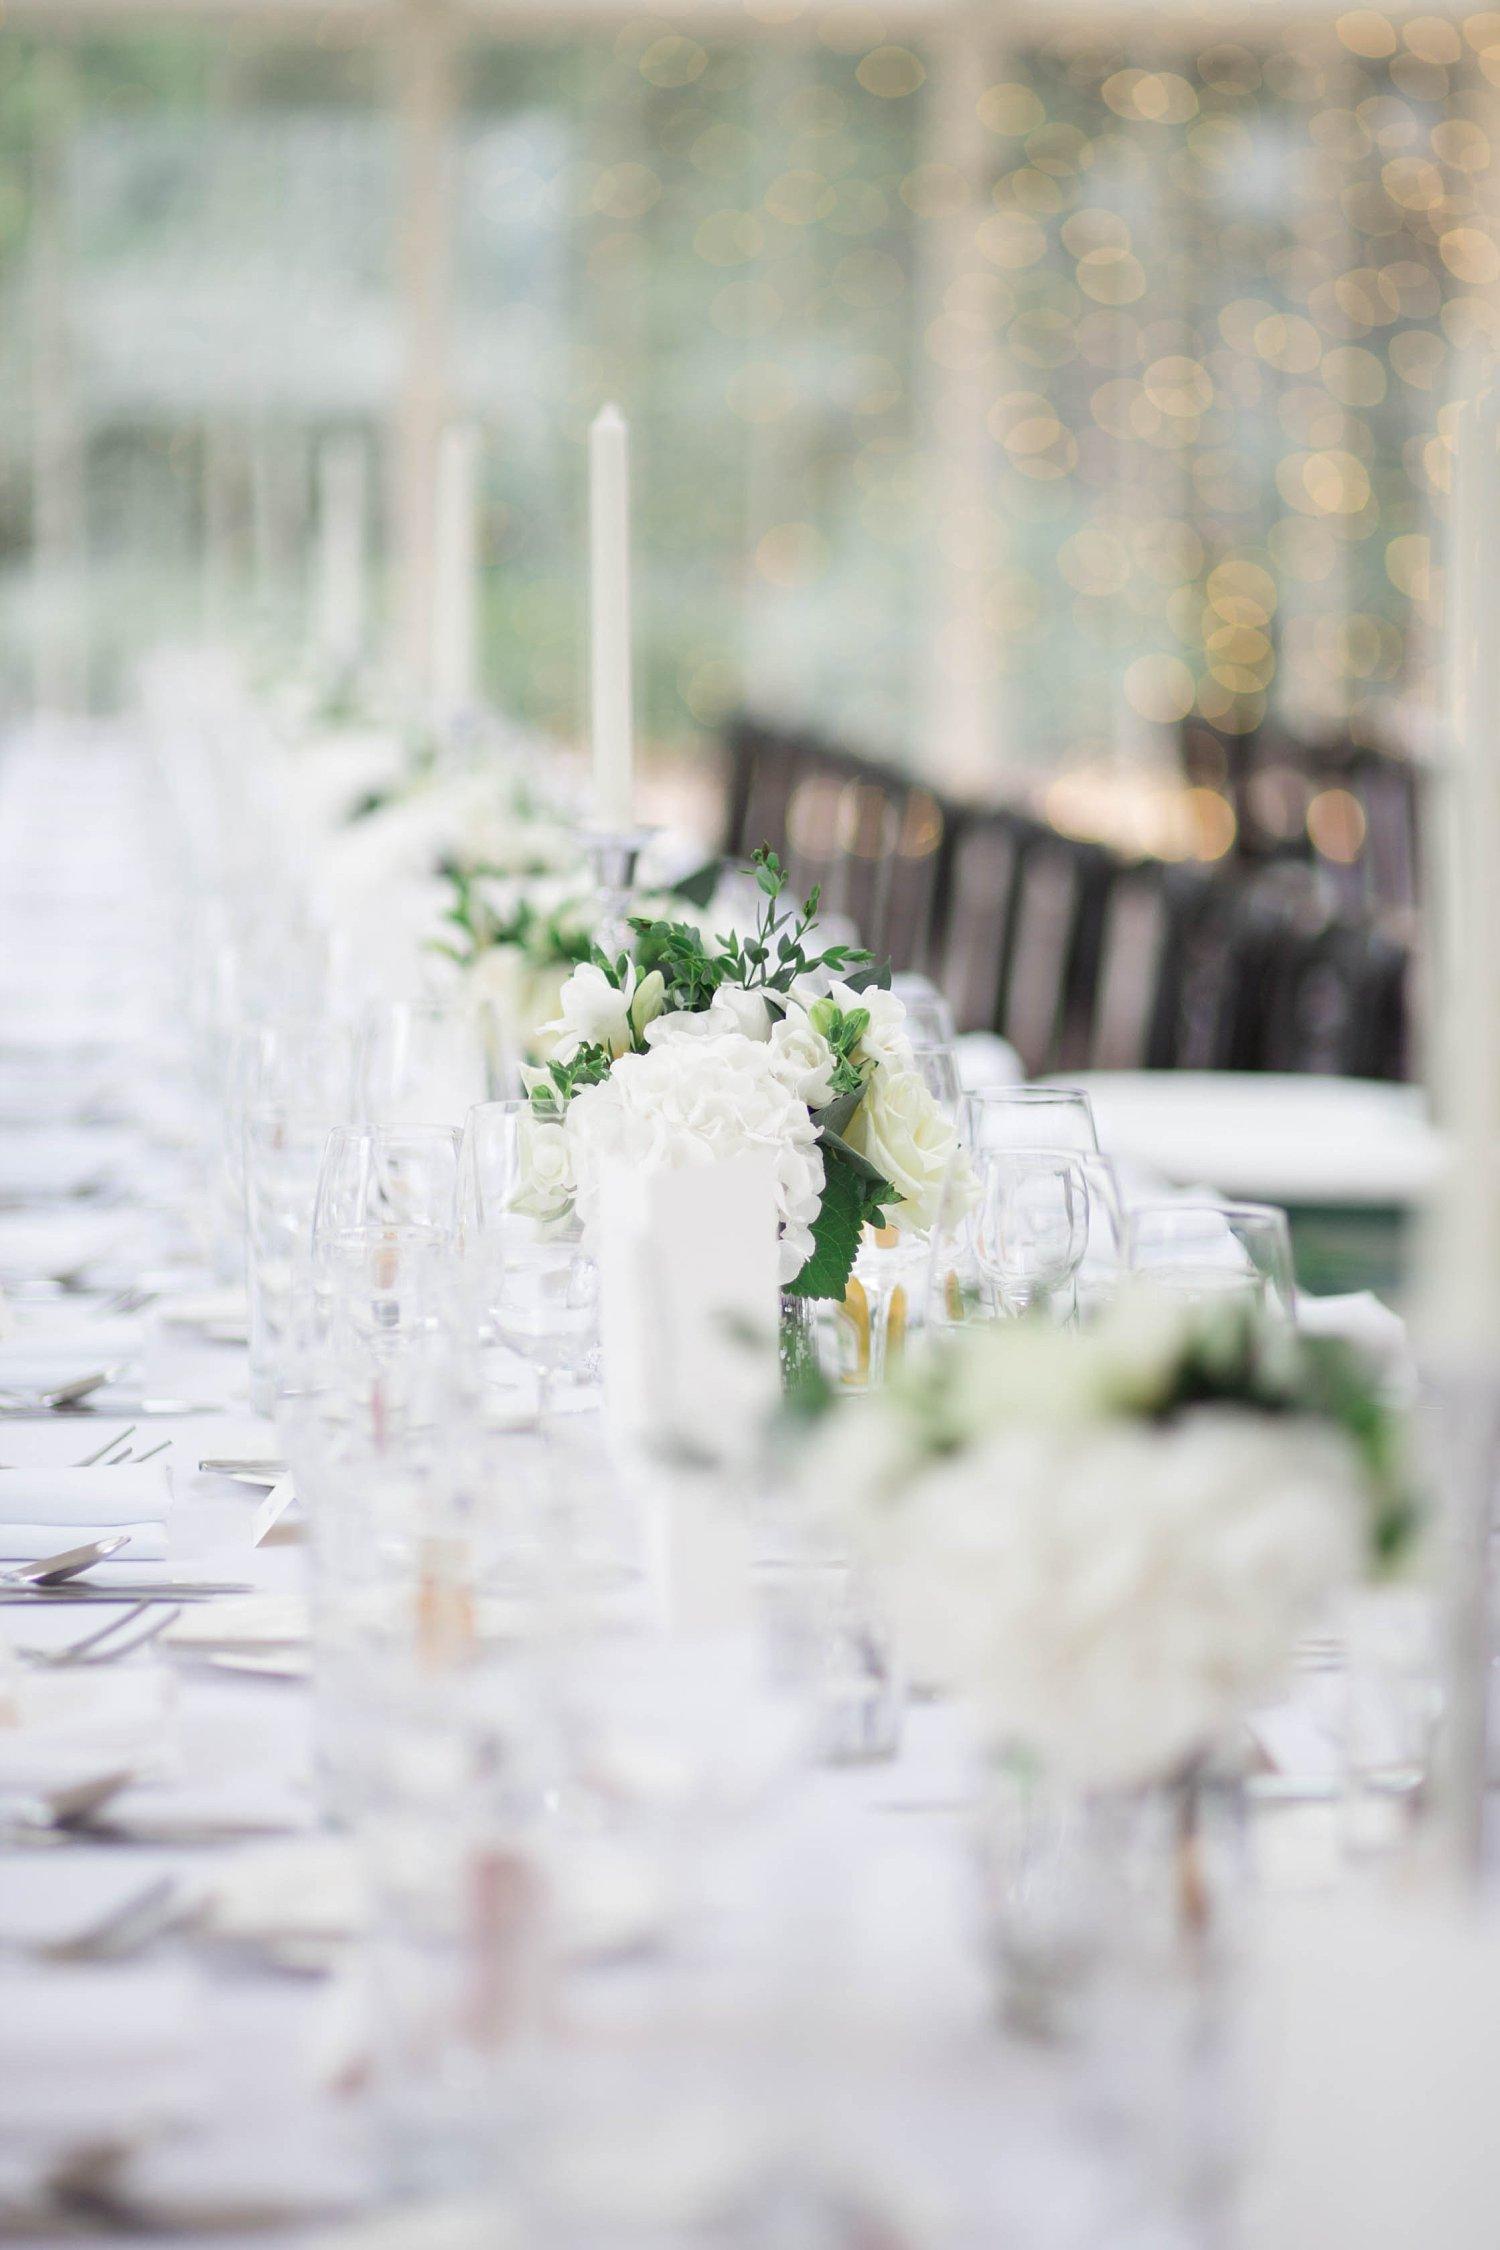 Luxury weddings in the UK. Carlowrie Castle wedding Autumn wedding photo